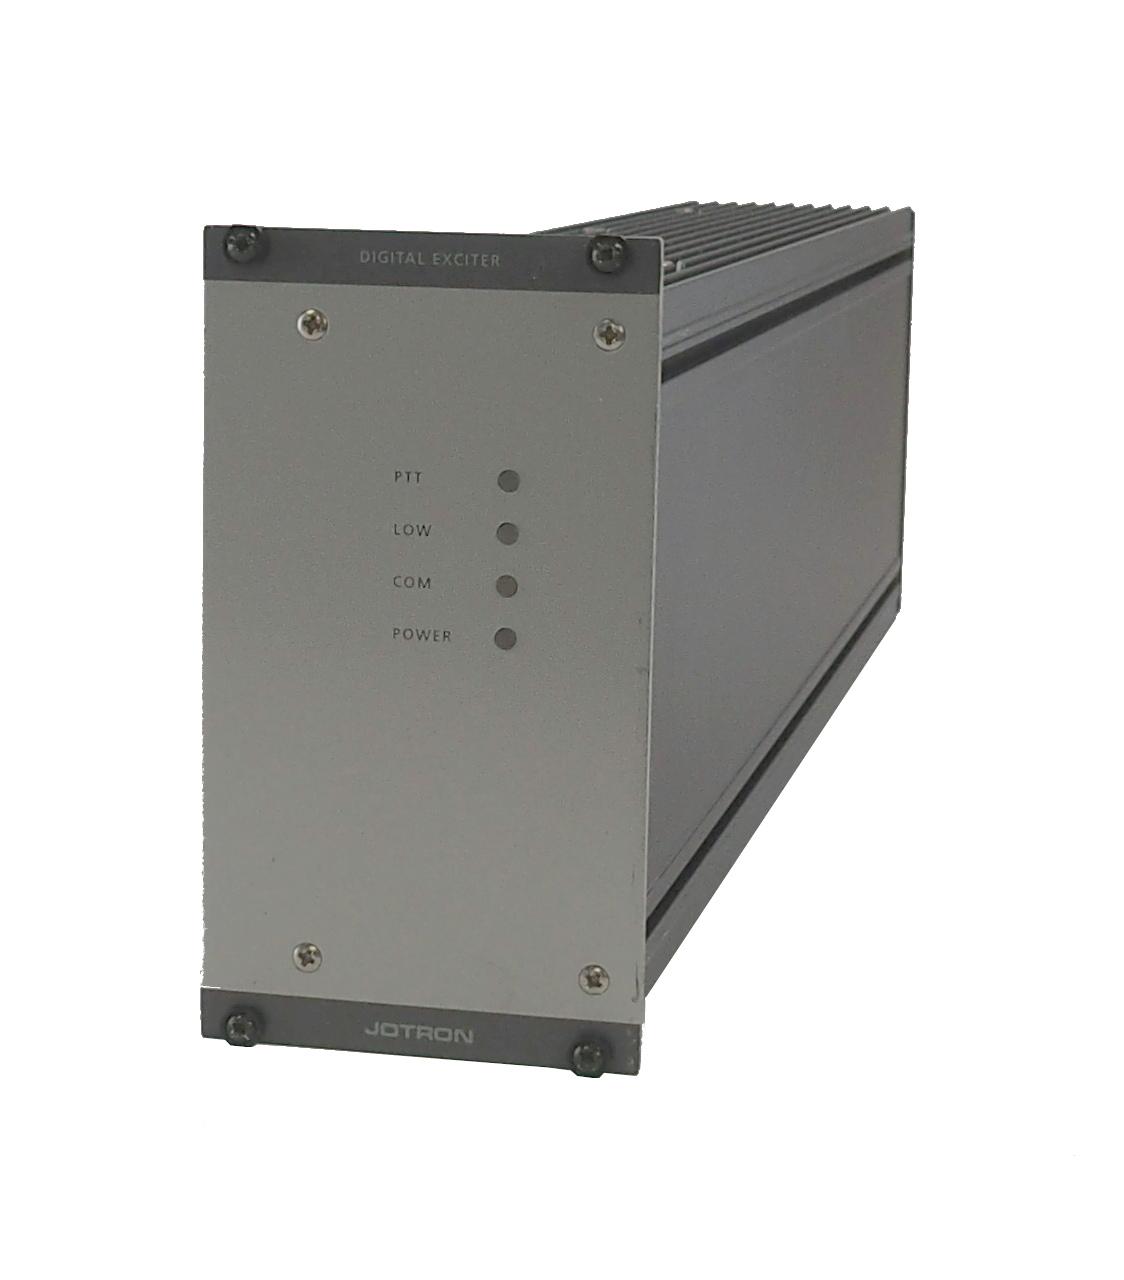 Jotron Digital Exciter Unit For TA-3225 25W UHF Transmitter